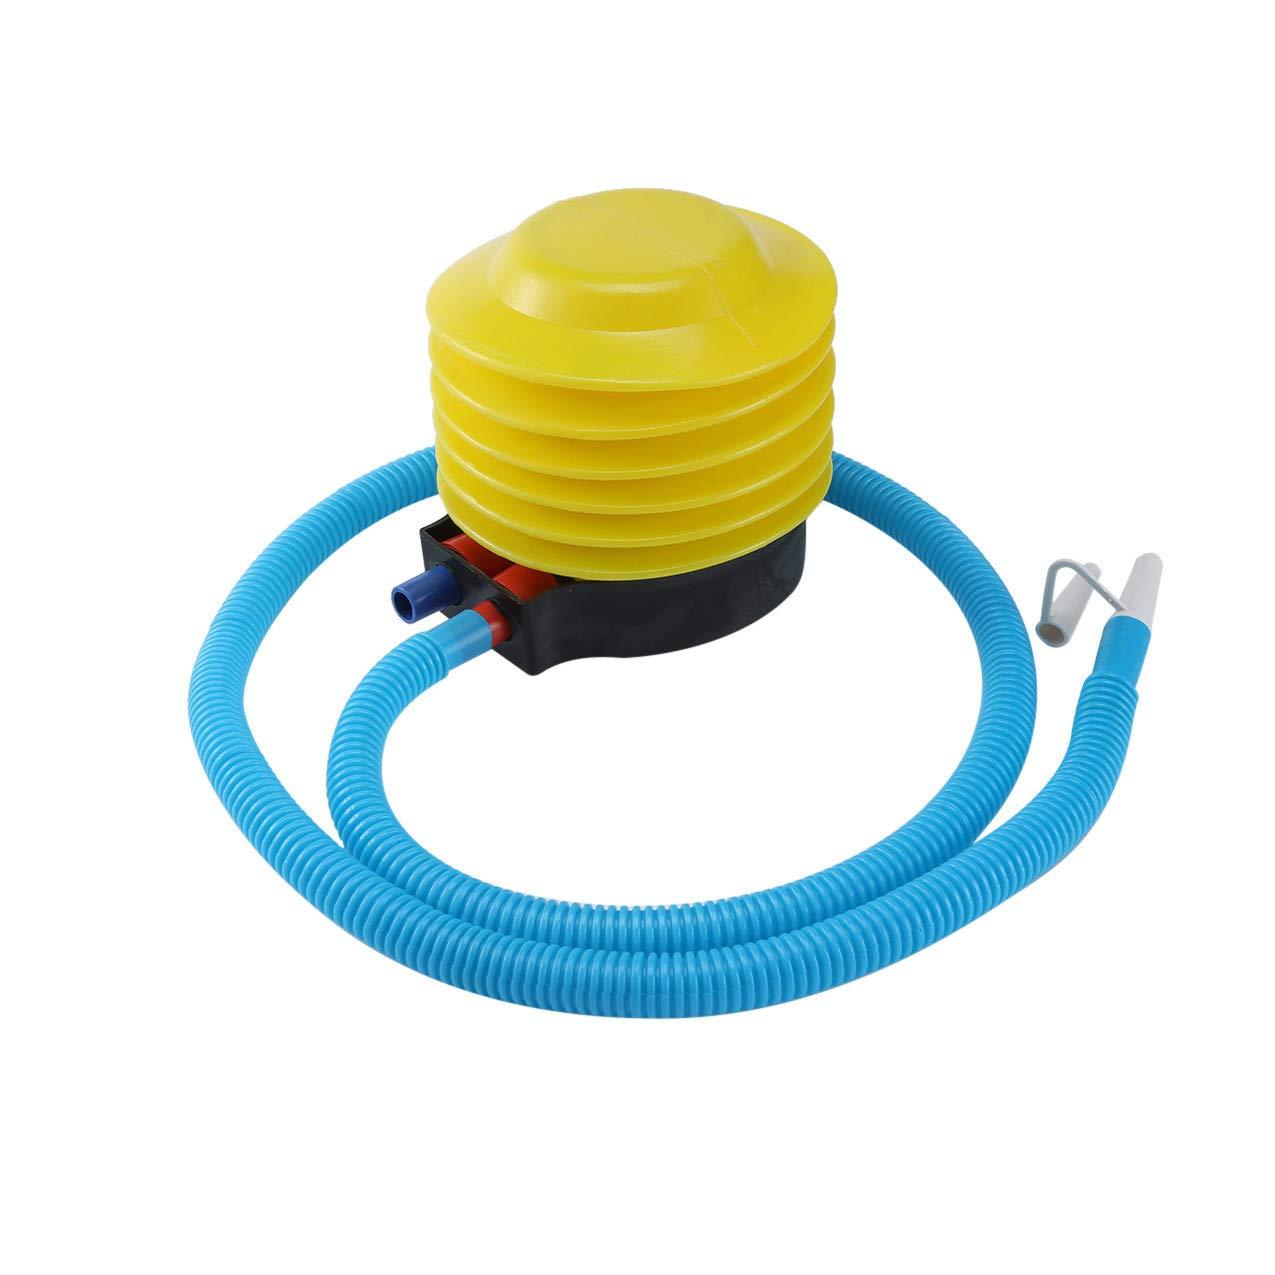 Foot Air Pump,Hpapadks Balloon Swimming Inflatable Toy Ball Inflates and Deflates Pump